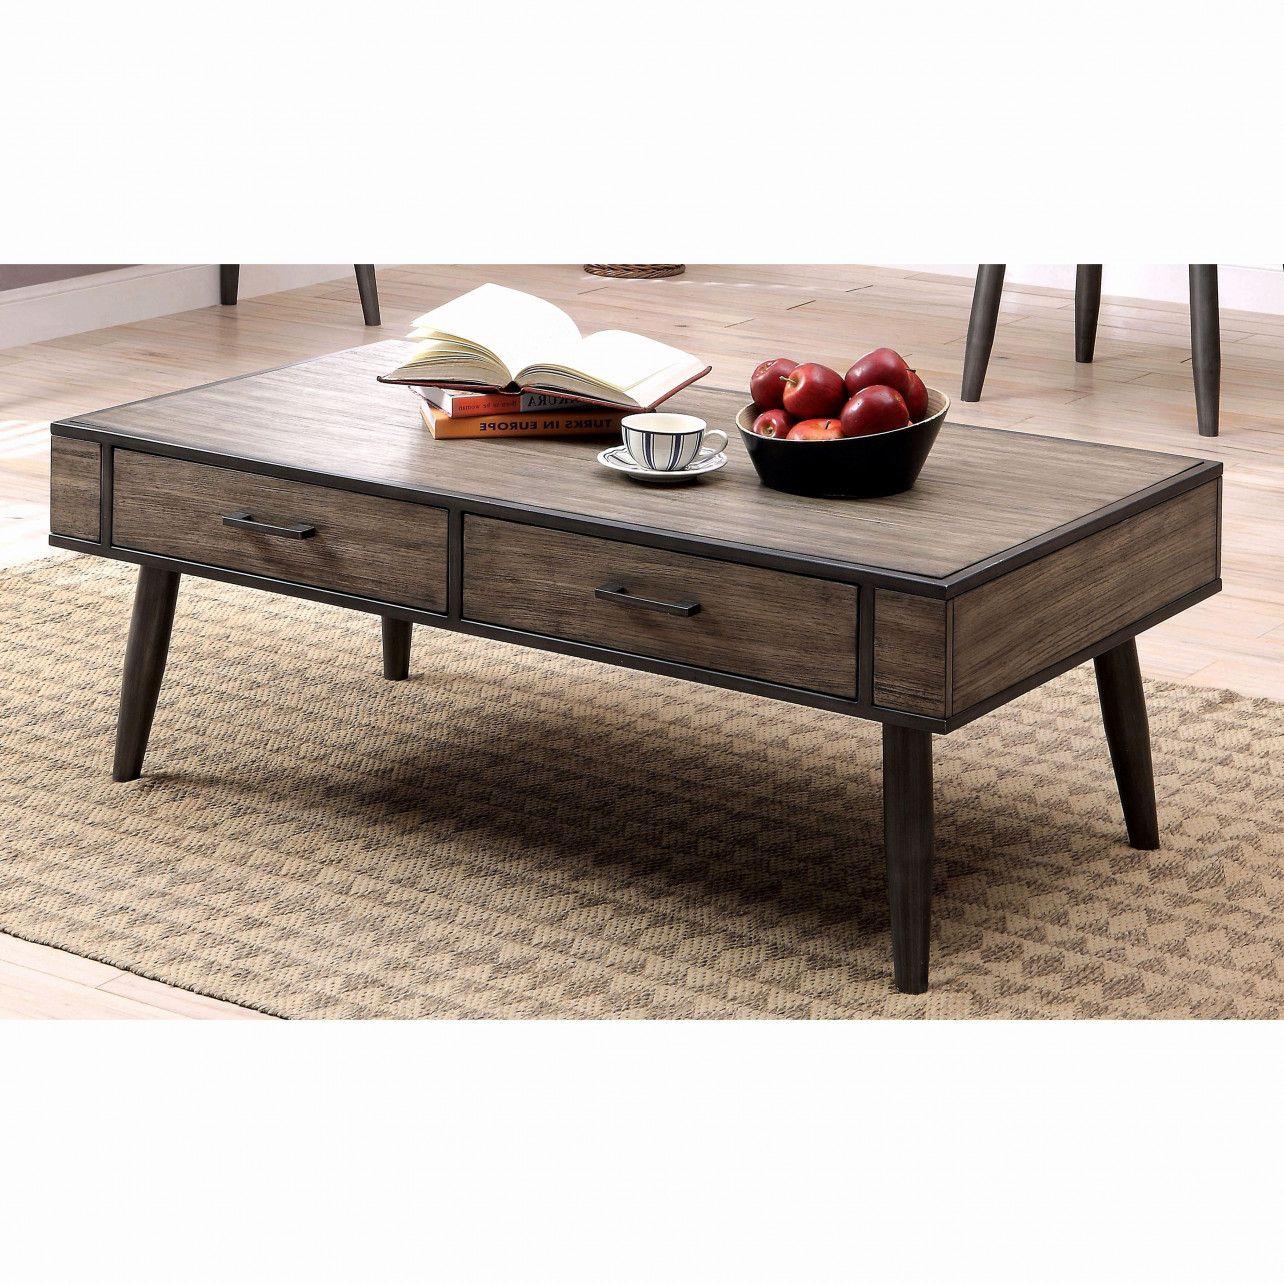 55 Beautiful Industrial Wheeled Coffee Table 2018